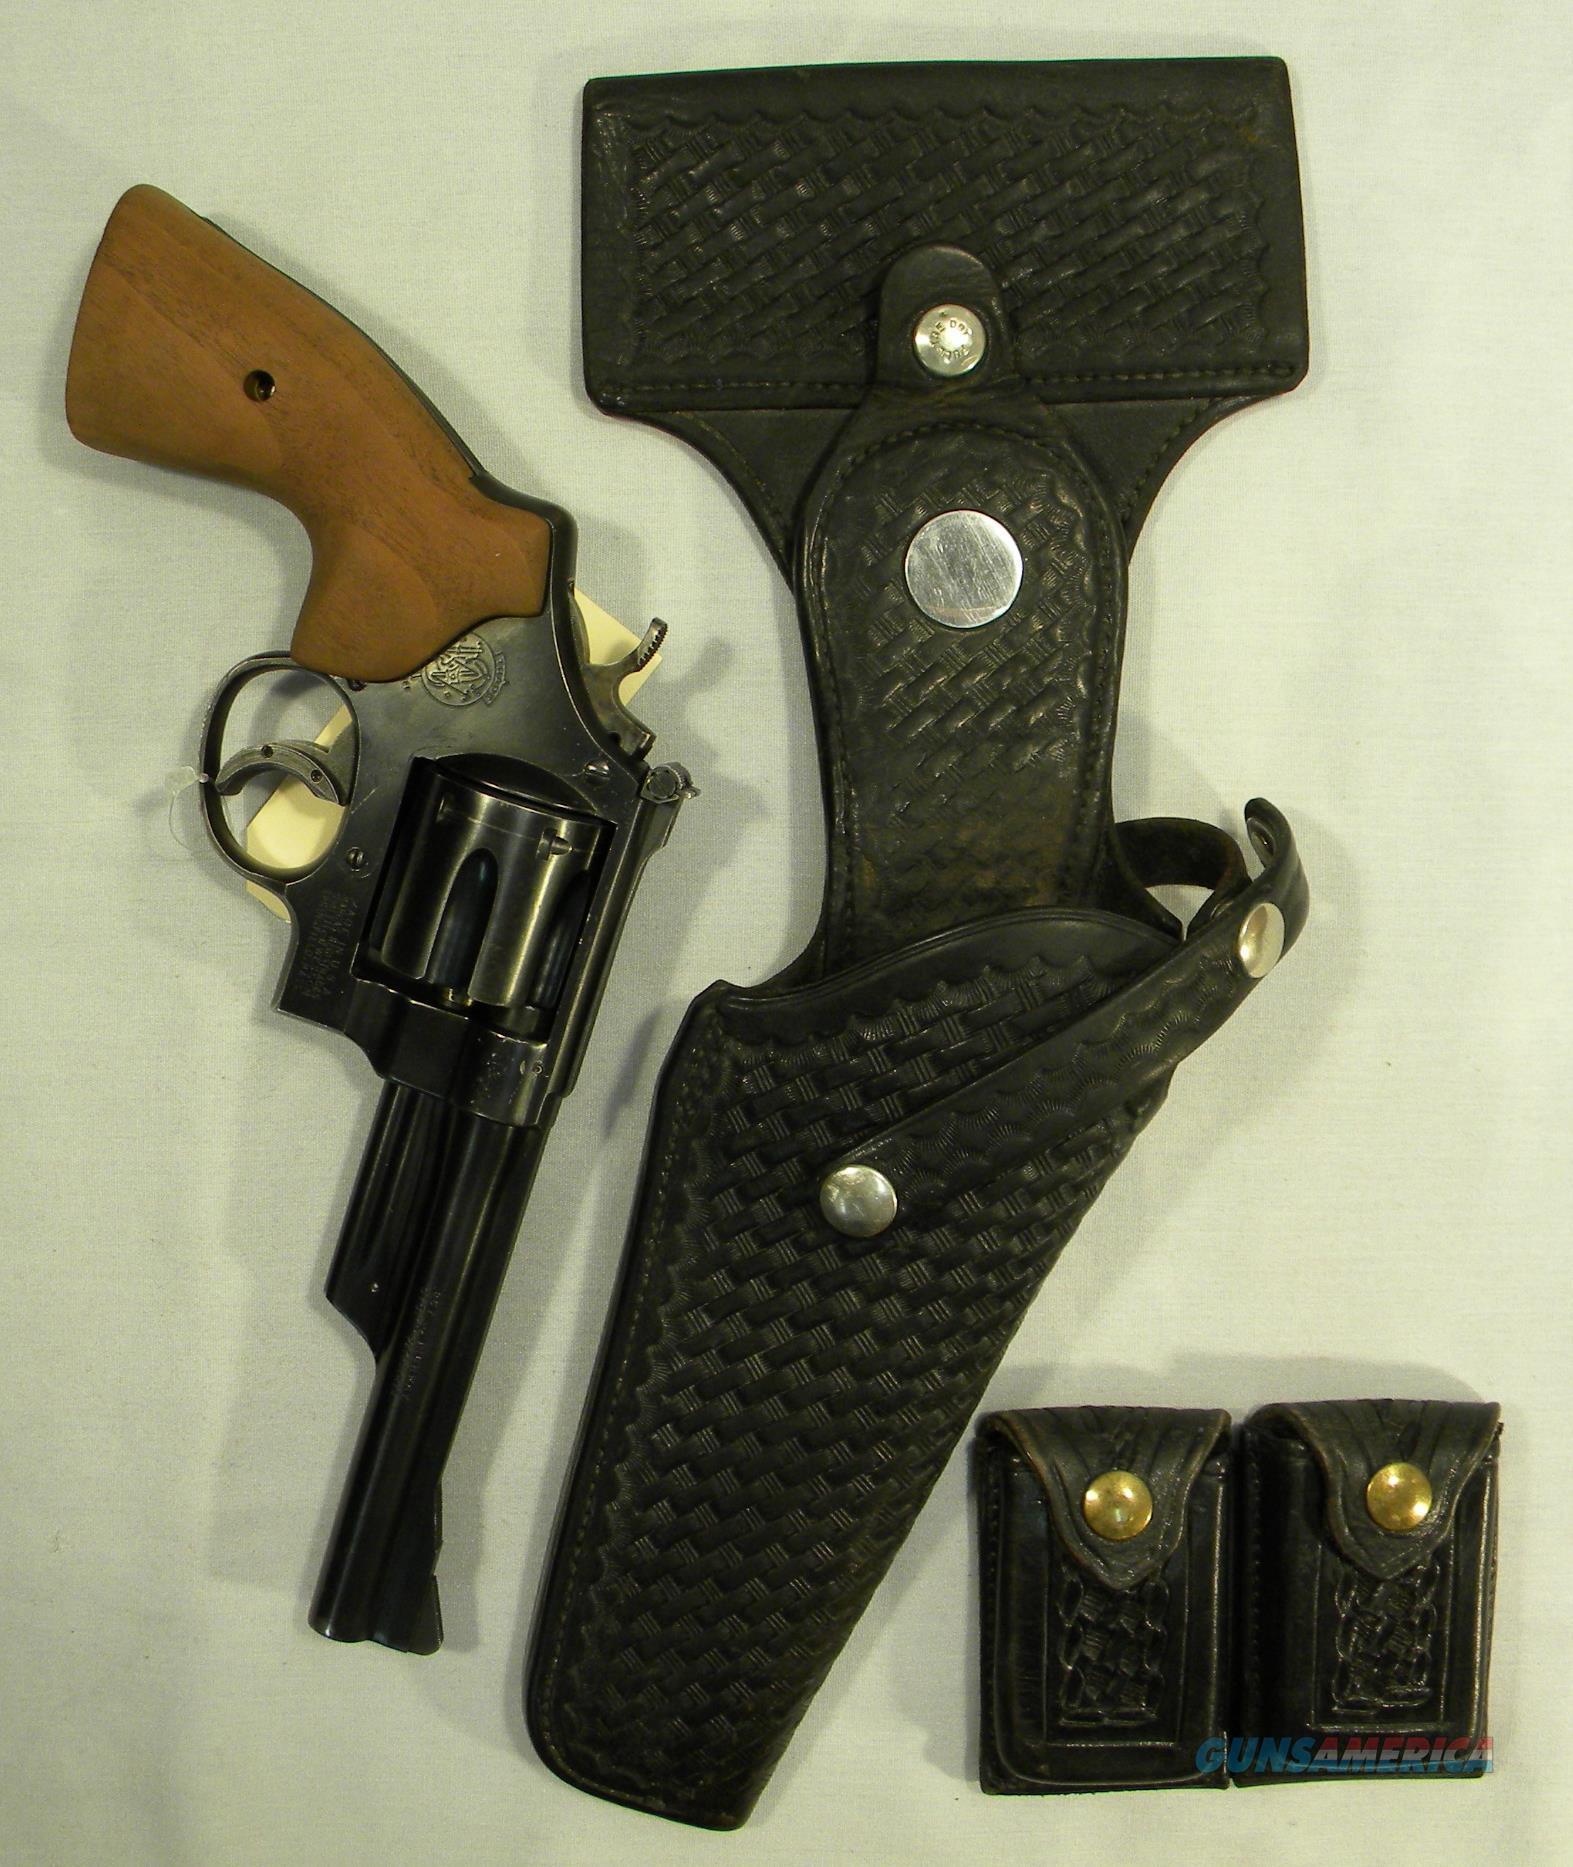 S&W 'Highway Patrolman', Pre-Mdl 28, S-Series 5-Screw, 6-Inch .357 Mag  Guns > Pistols > Smith & Wesson Revolvers > Full Frame Revolver